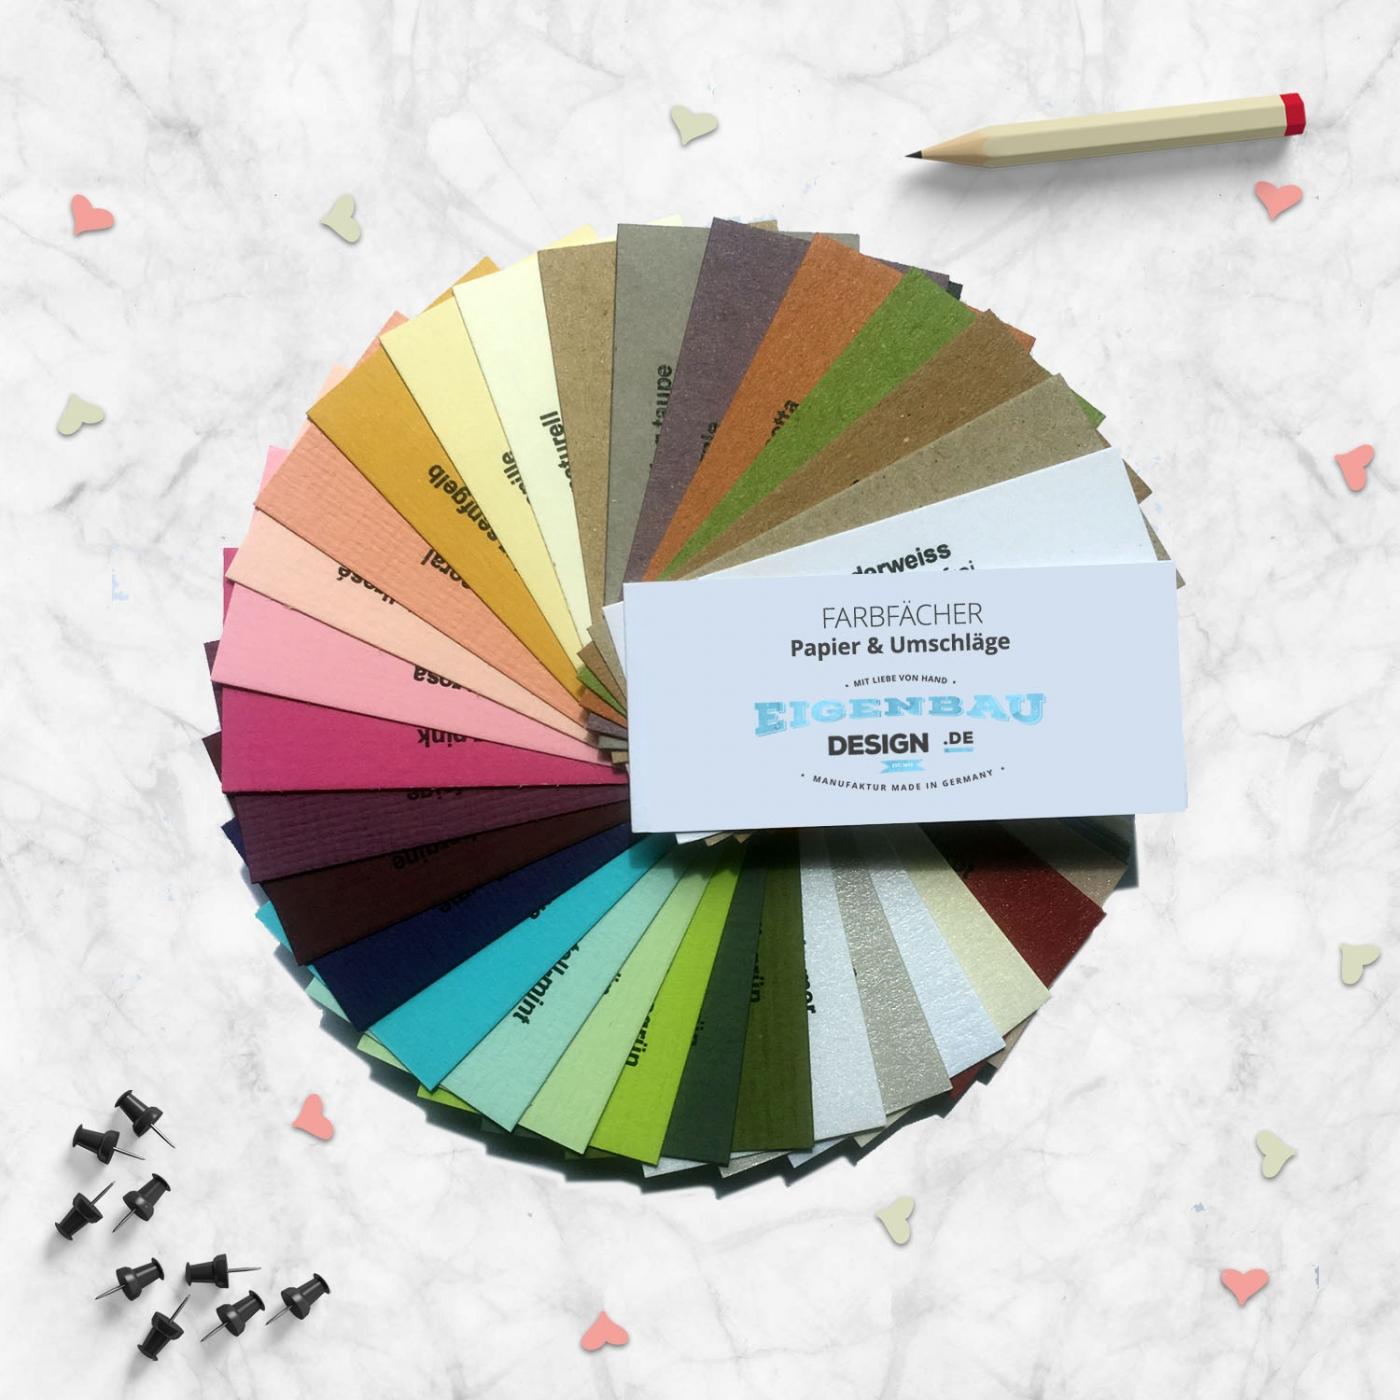 Papier & Umschläge FarbMuster